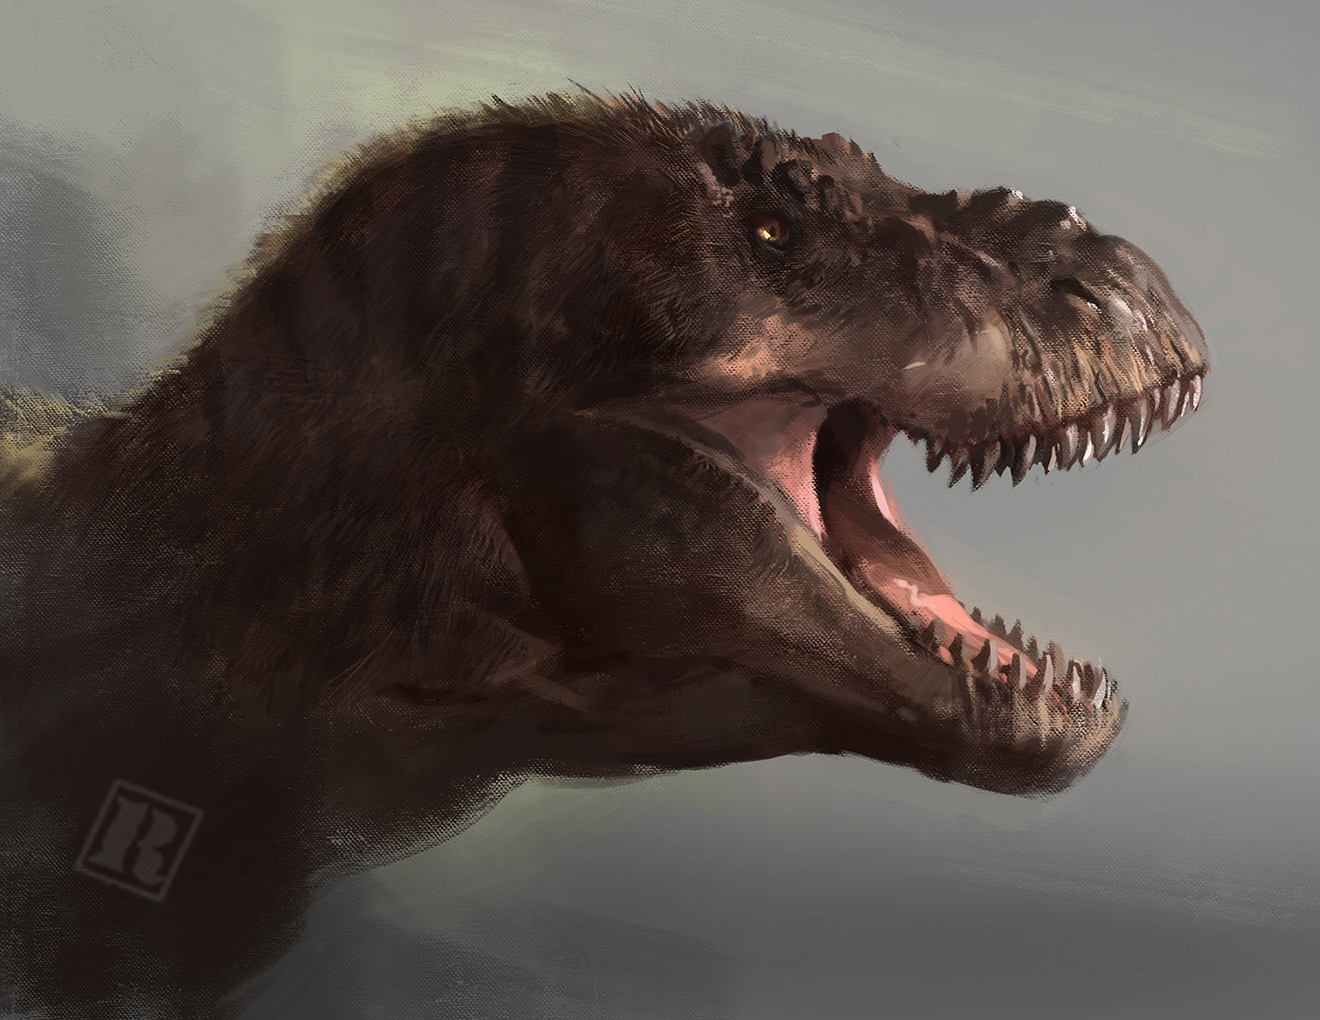 Raph lomotan raph04art jpfeathered rexy